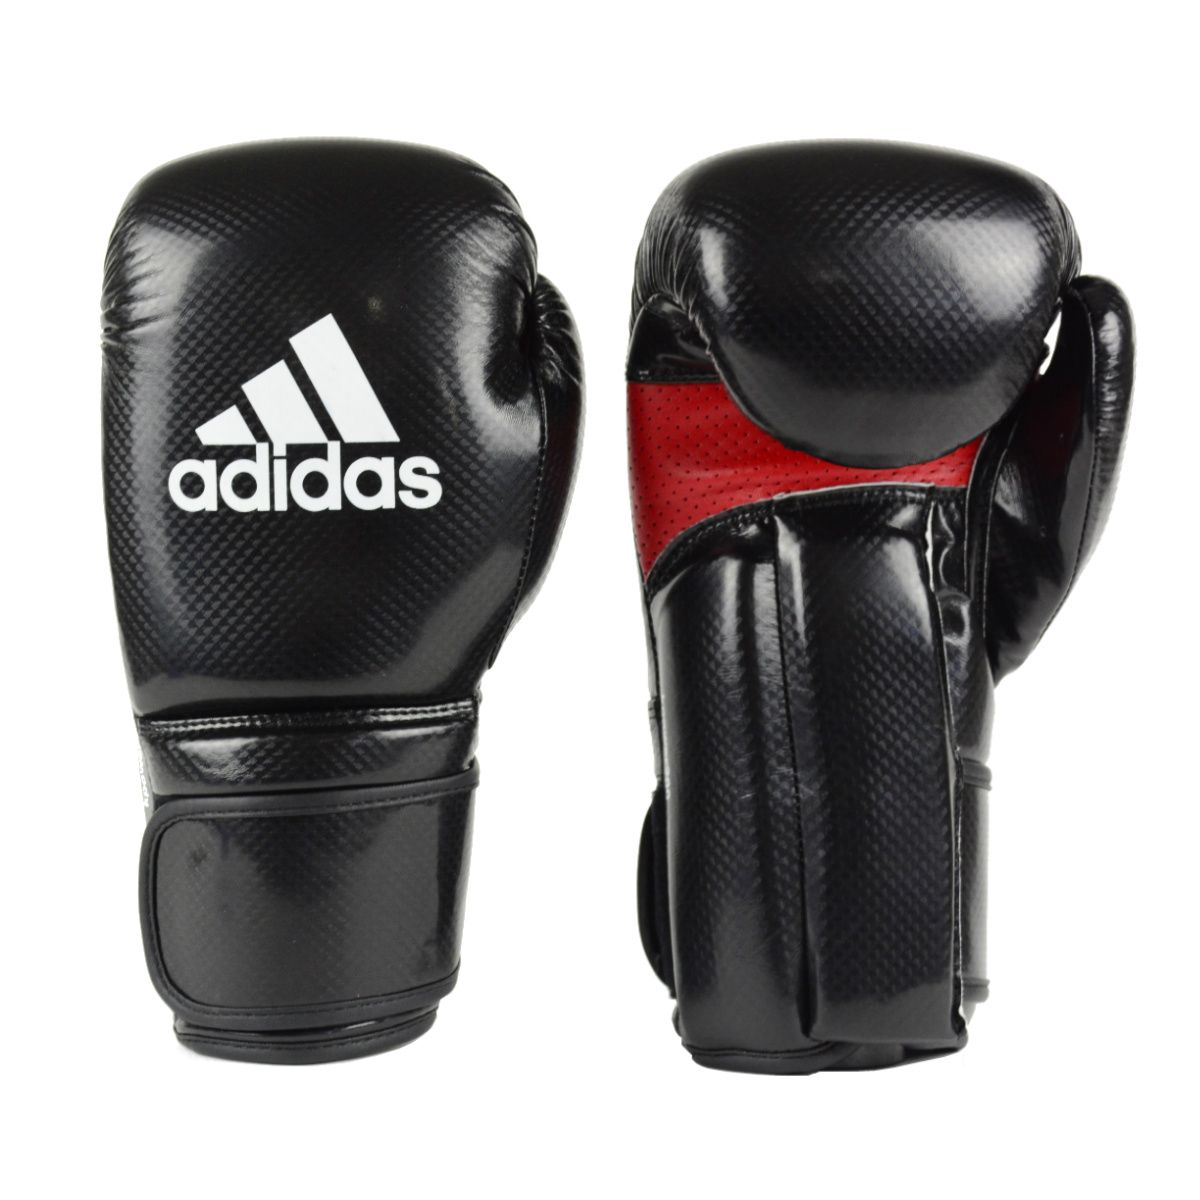 Luva Kick Boxing Adidas KPOWER 200 Preto/Vermelho